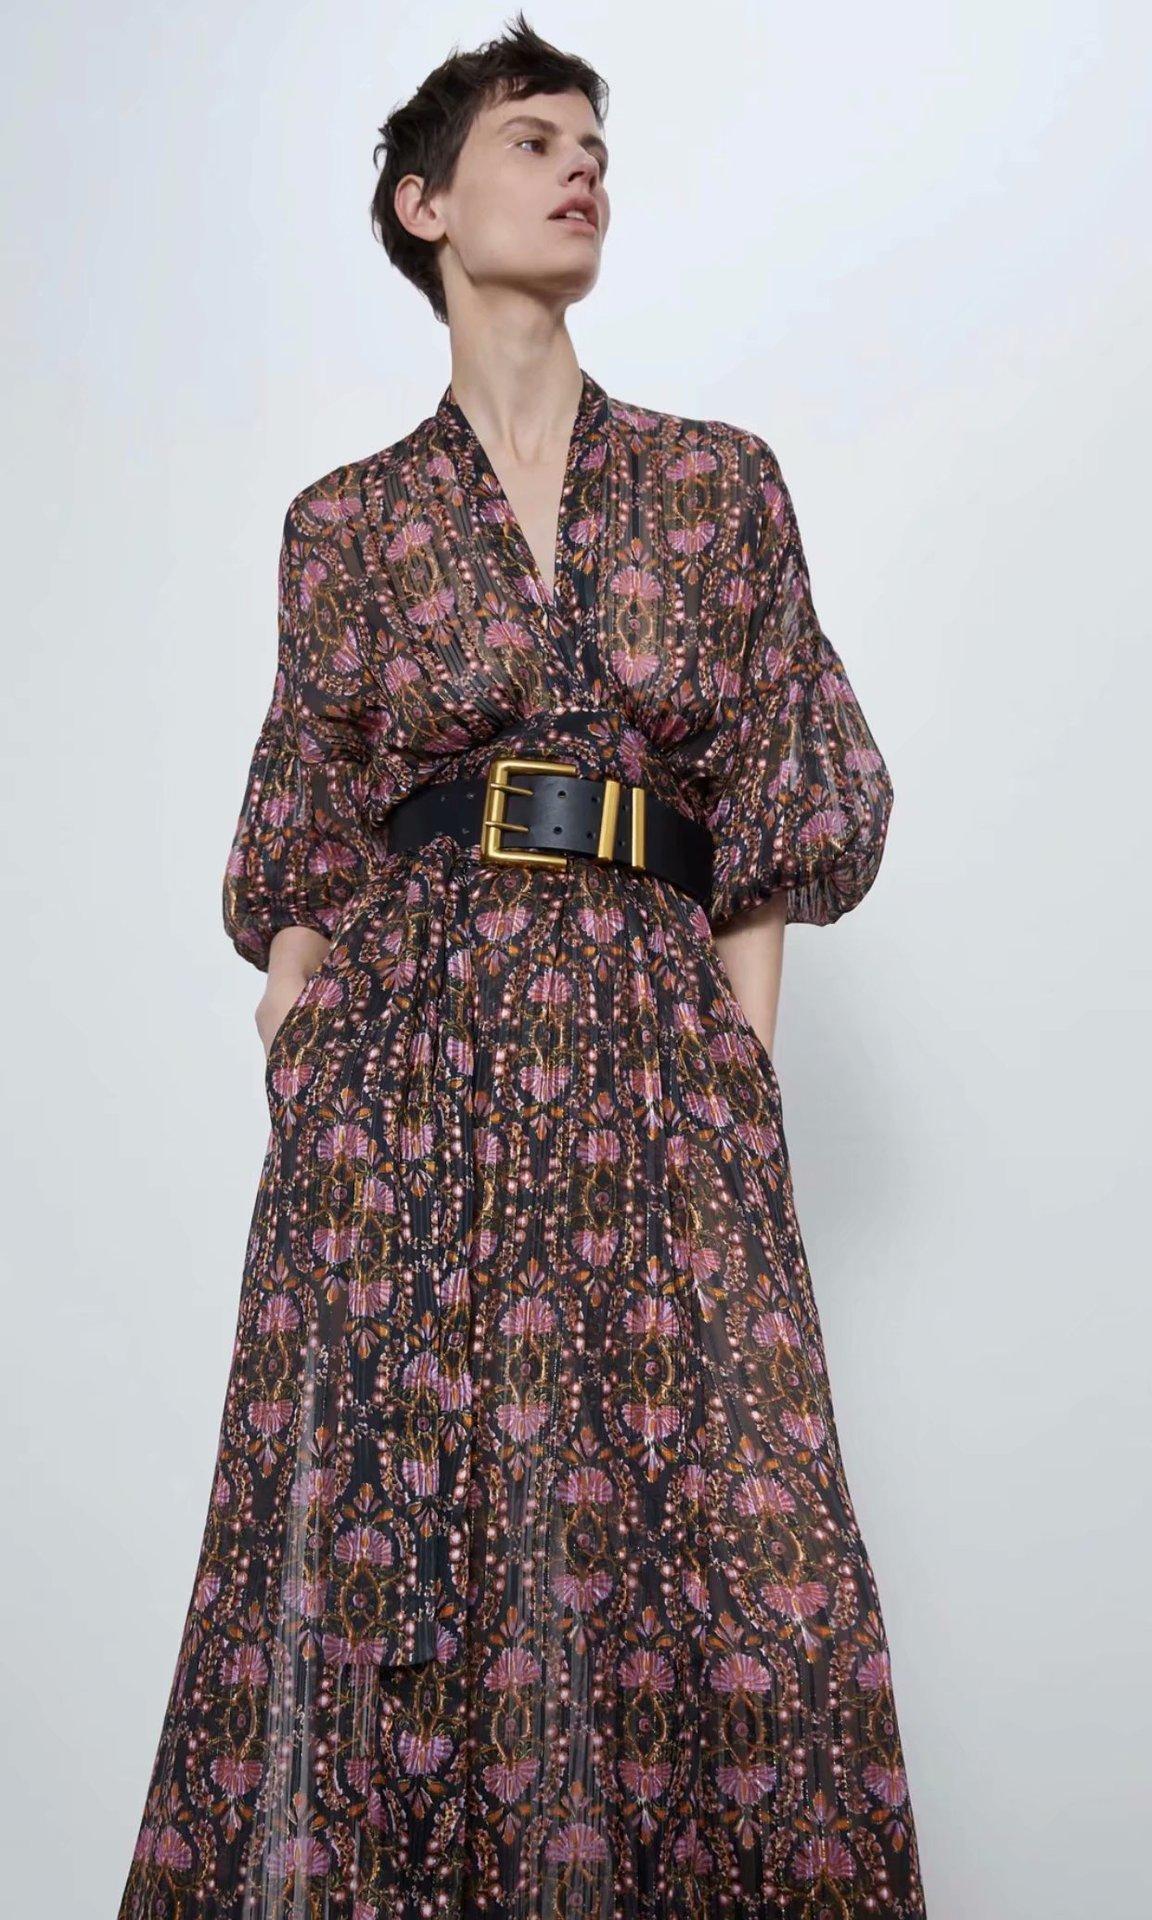 2020 New Spring Summer New Style European Streetwear Floral Printed Female Dress Zaraing Vadiming Sheining Women Dress XDN9457